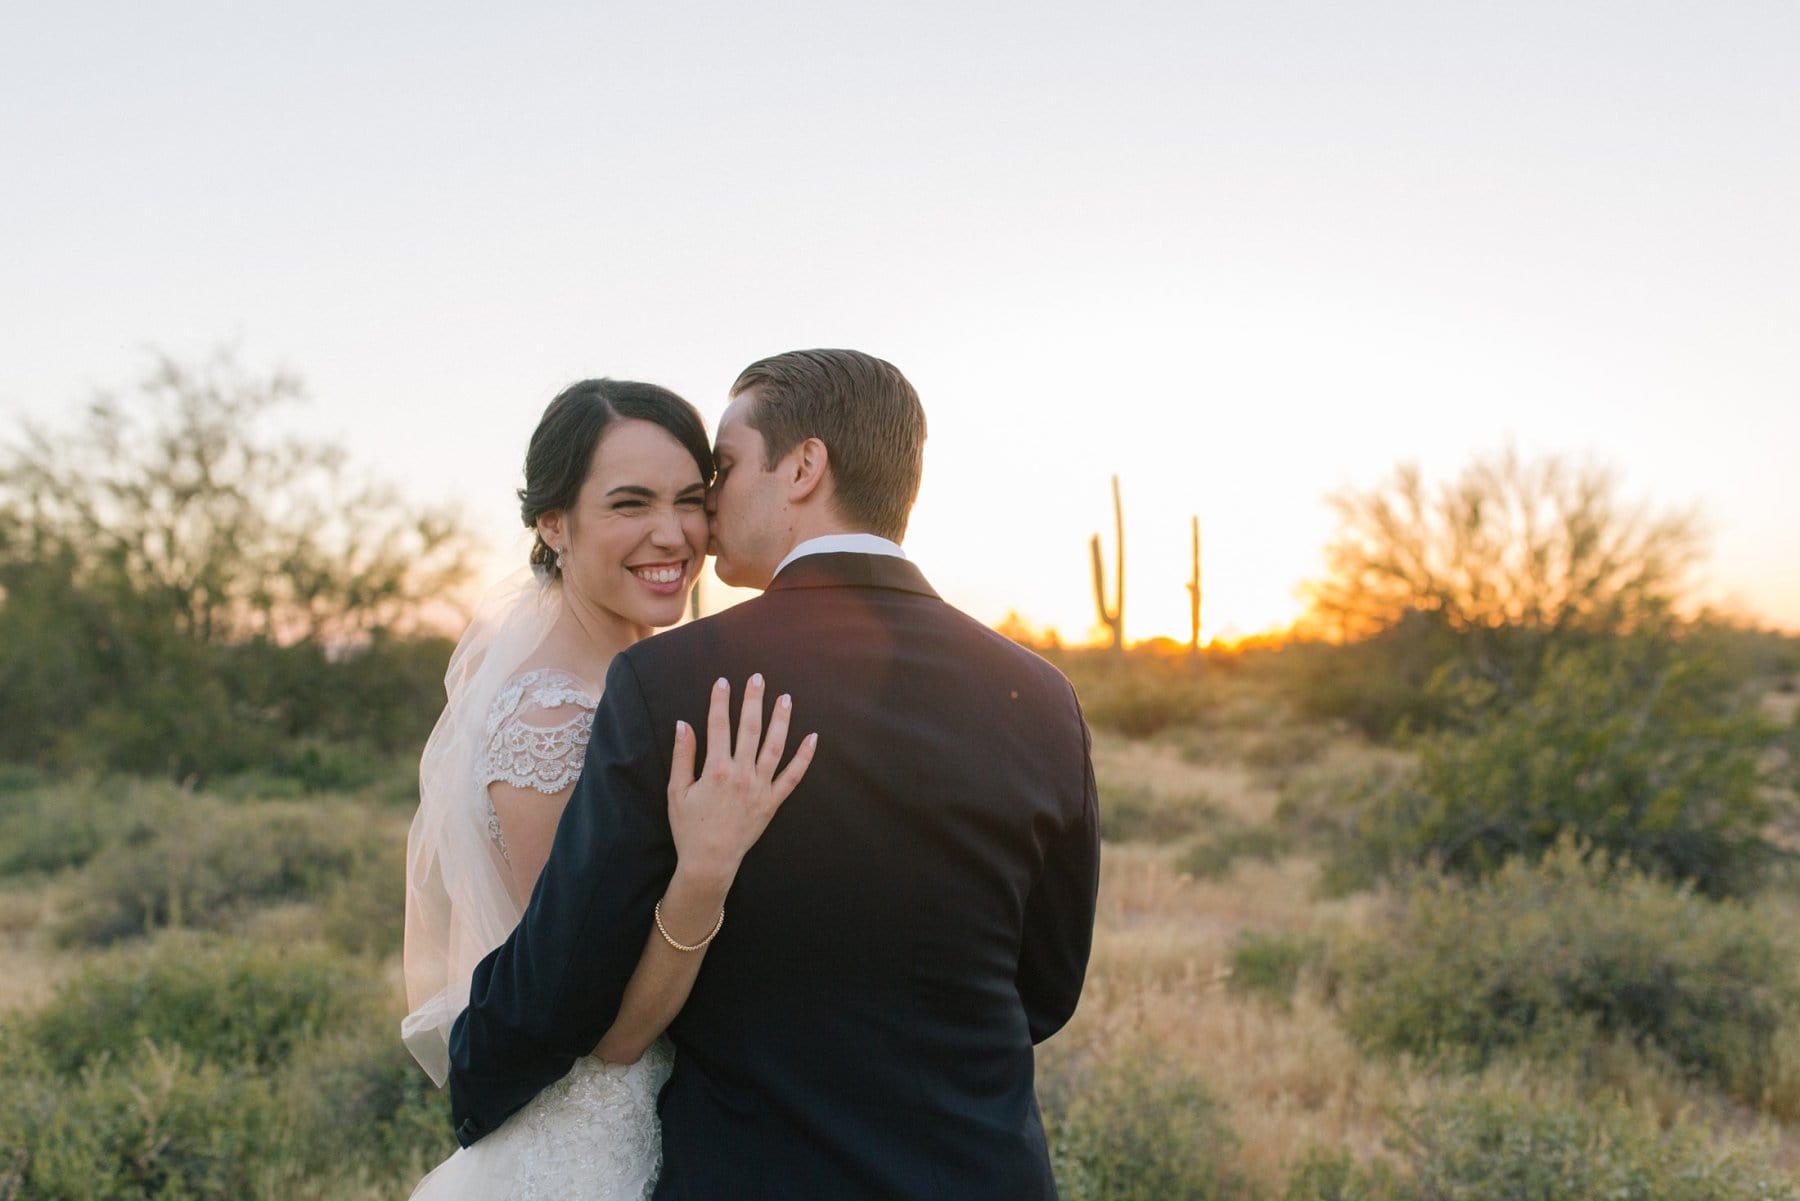 natural laughing bride and groom photos in Arizona desert at Desert Foothills wedding venue